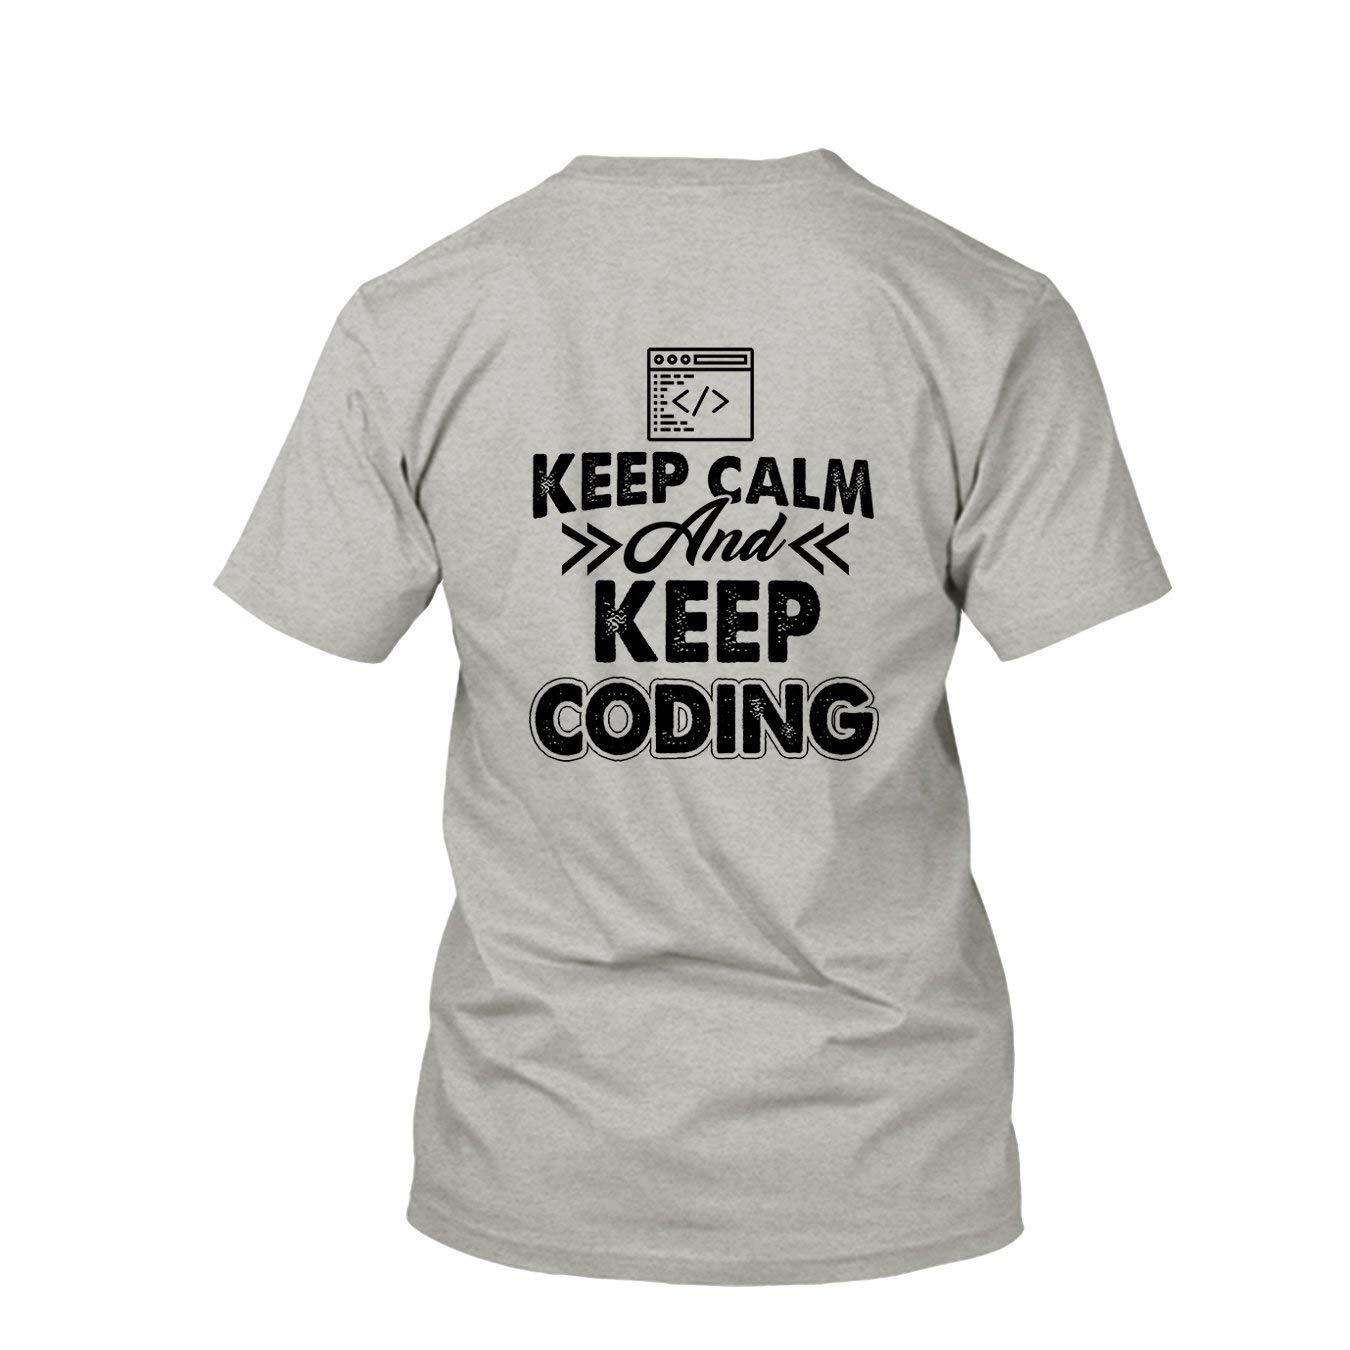 d42cfe1f Amazon.com: Are Black Programmer Keep Coding Unisex Shirt, Short Sleeve Tee  Shirts: Clothing